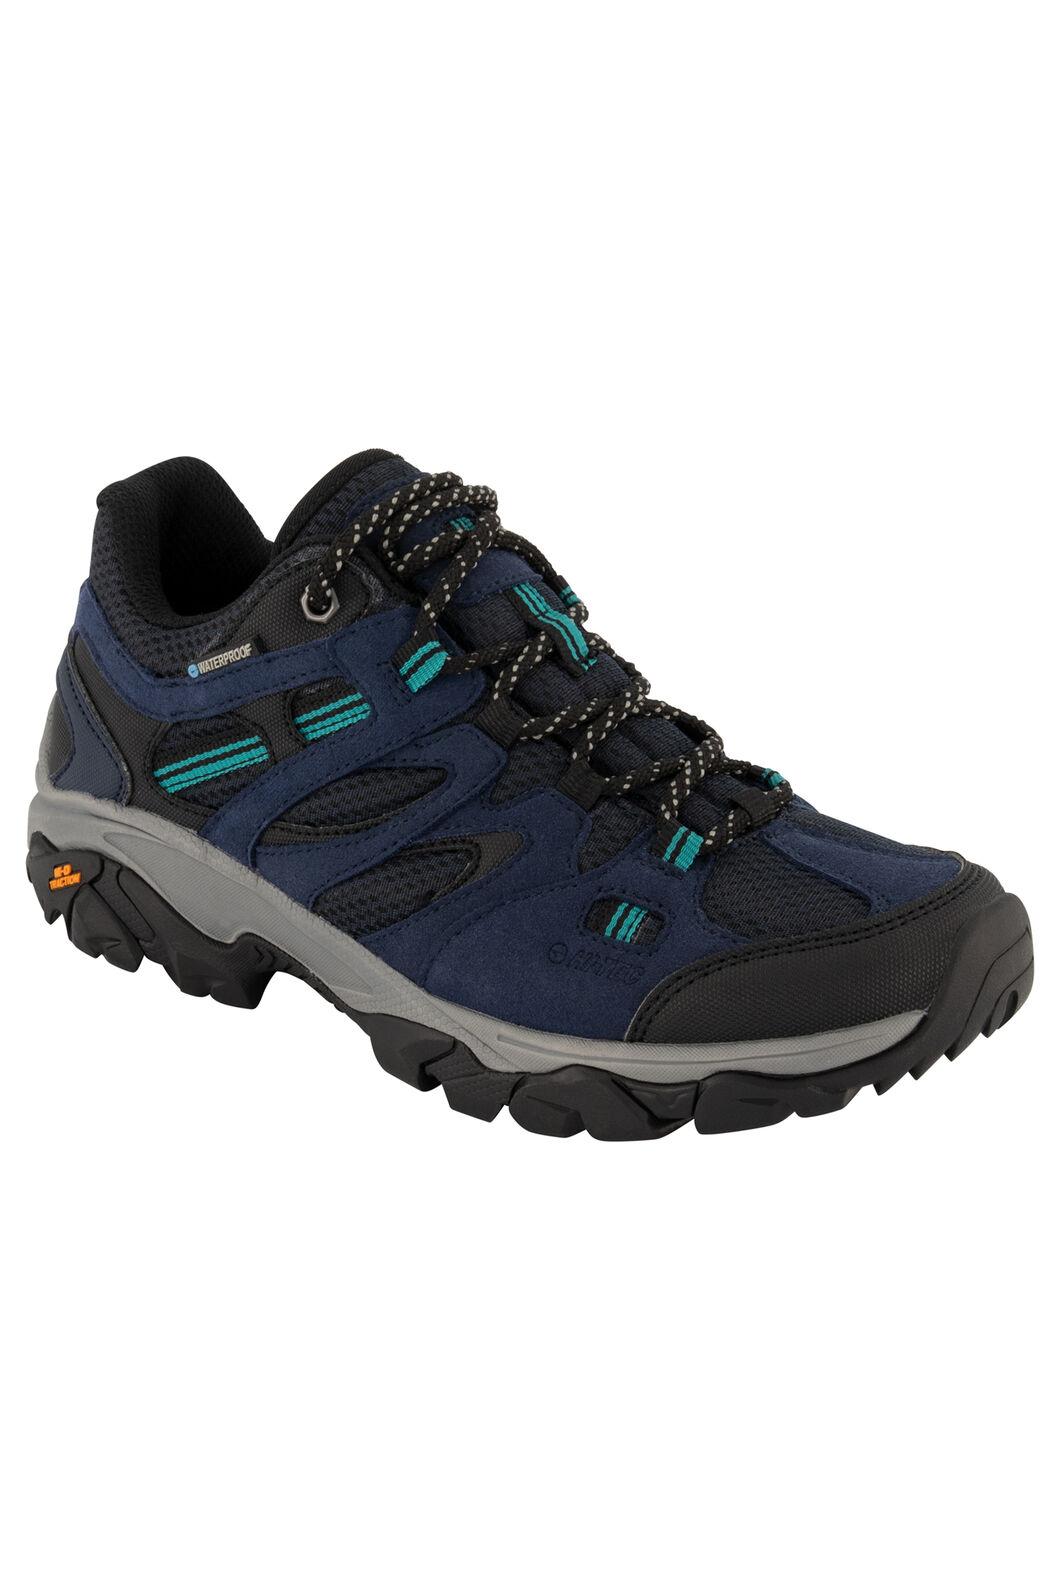 Hi-Tec Ravus Vent Lite WP Low Hiking Shoes — Women's, Midnight/Black Navigate, hi-res